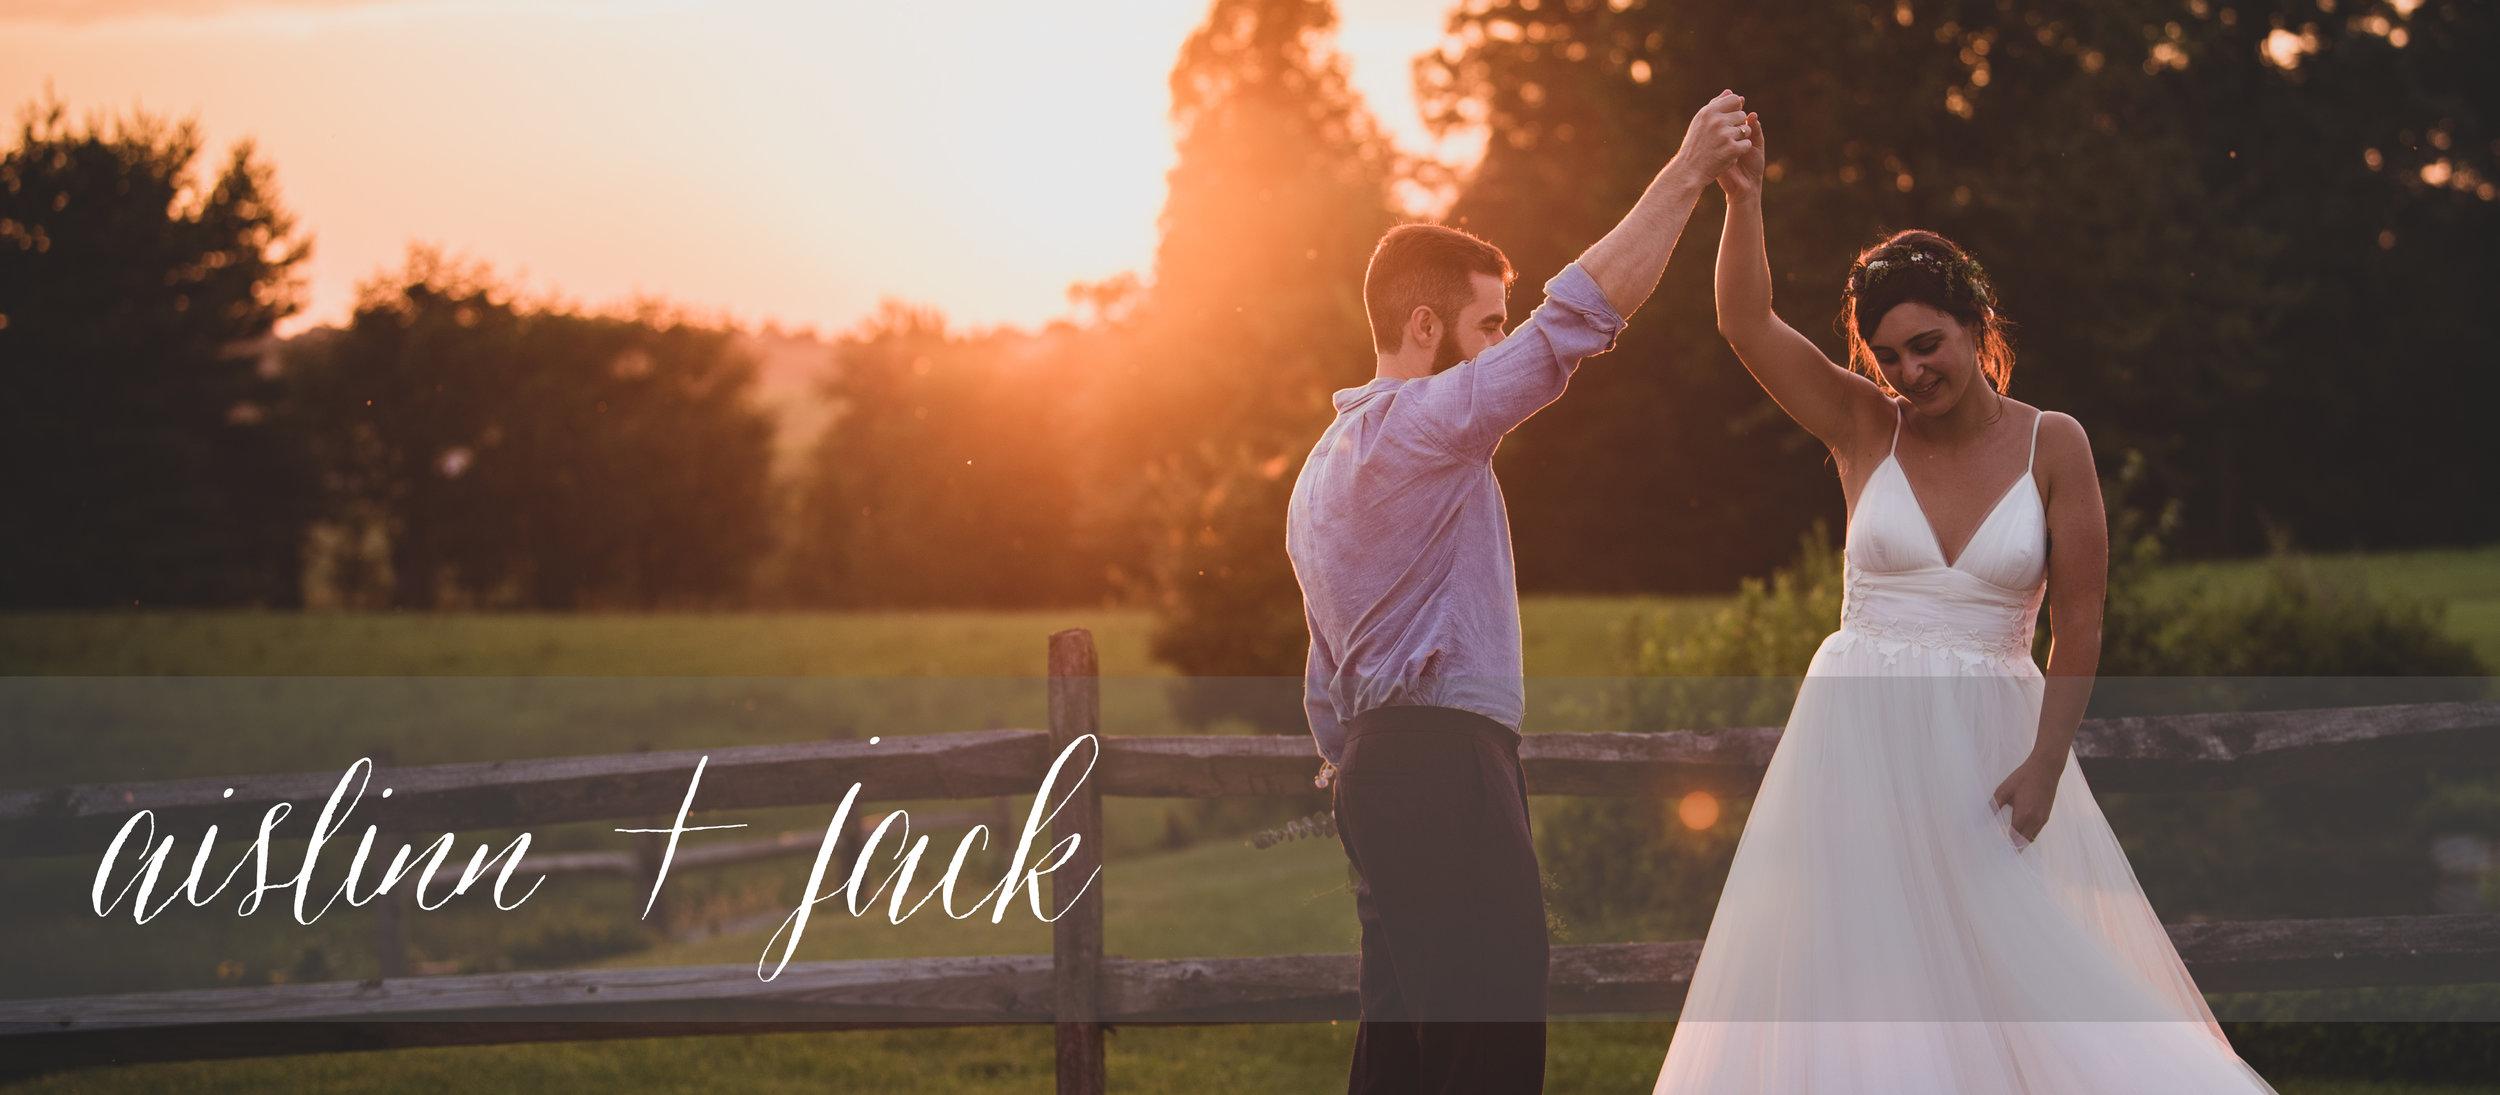 best washington DC wedding photographers casual genuine color story.jpg